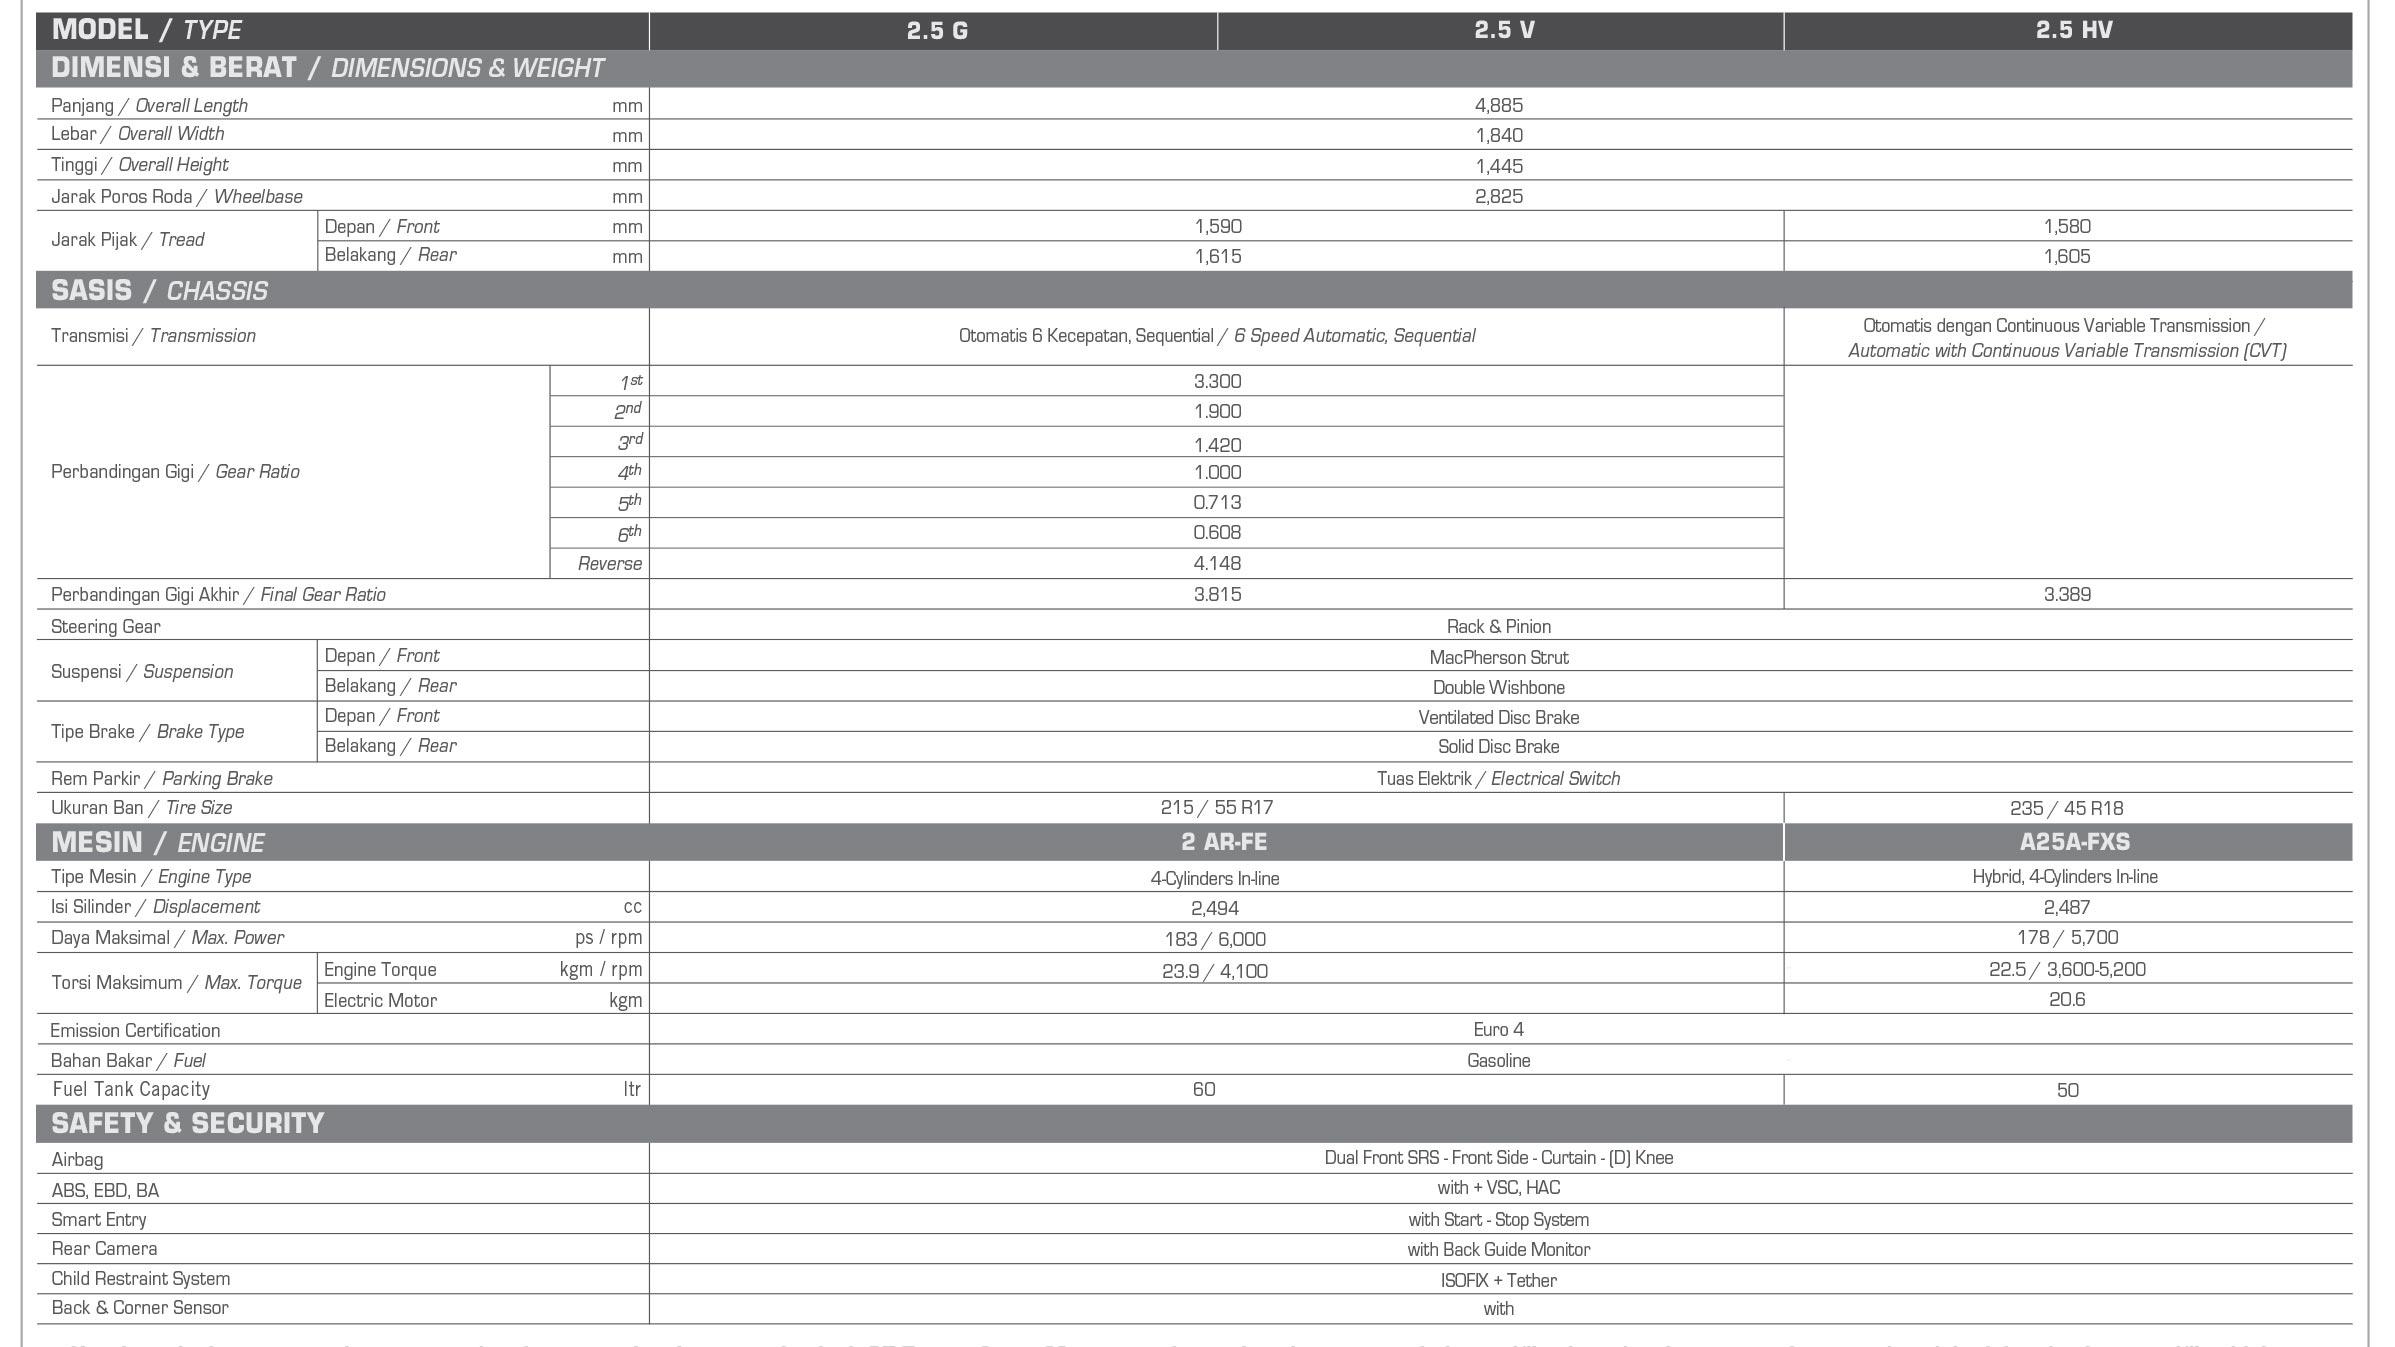 Spesifikasi Mesin All New Camry Hybrid